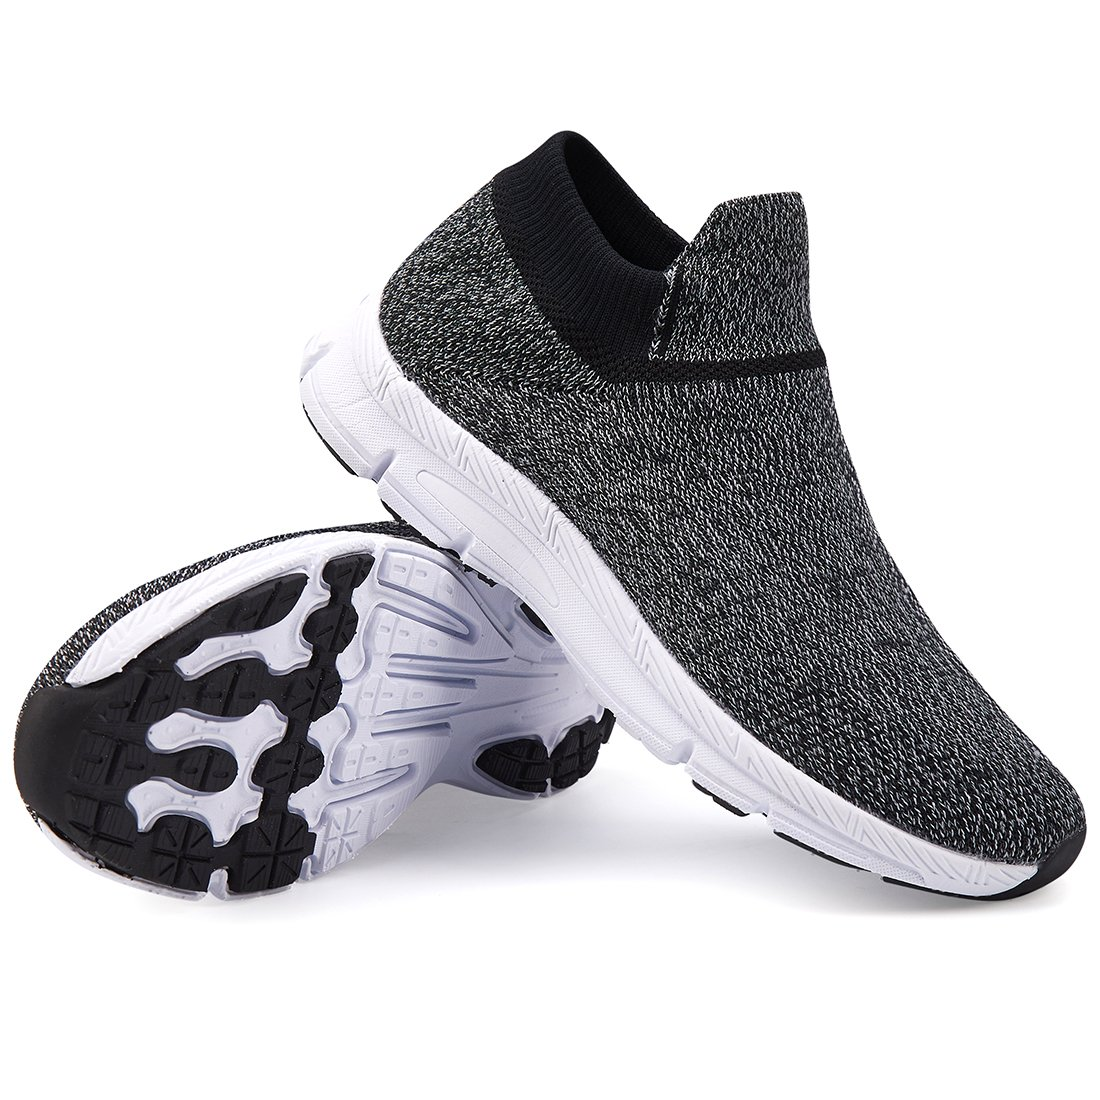 VIFUUR Girls Boys Socks Shoes Fashion Casual Walking Shoes Breathable Lightweight Sneakers for Kids